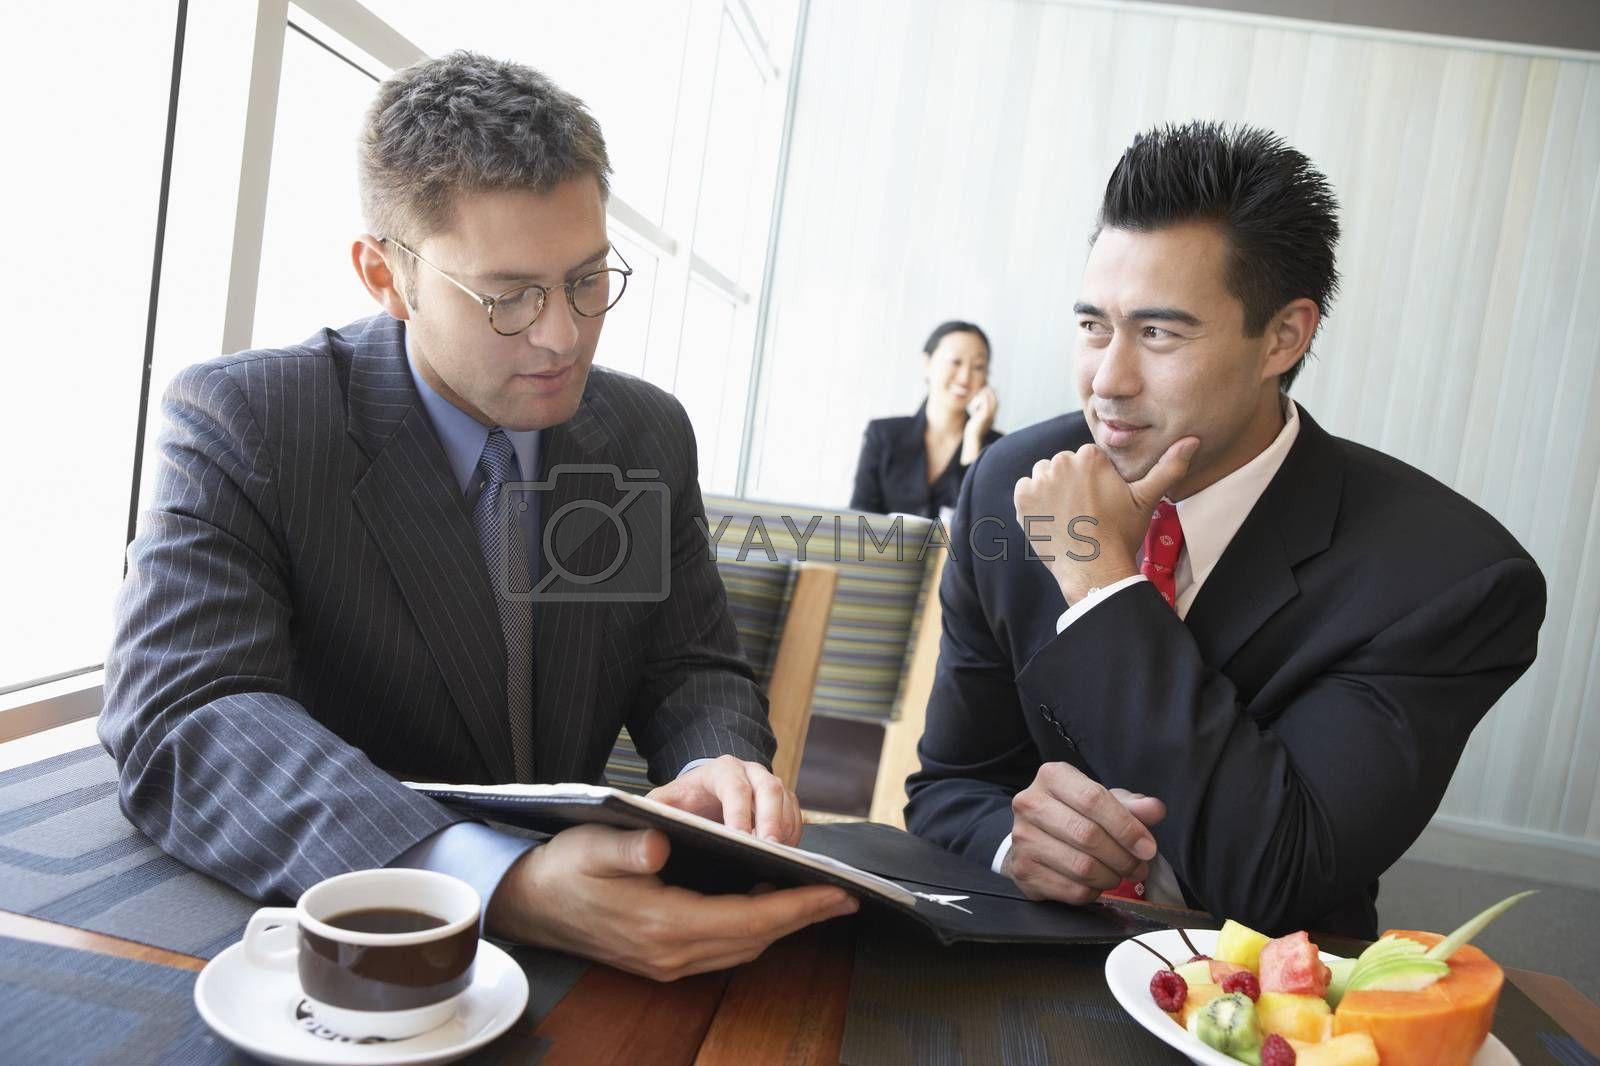 Businessmen Discussing Contract In Restaurant